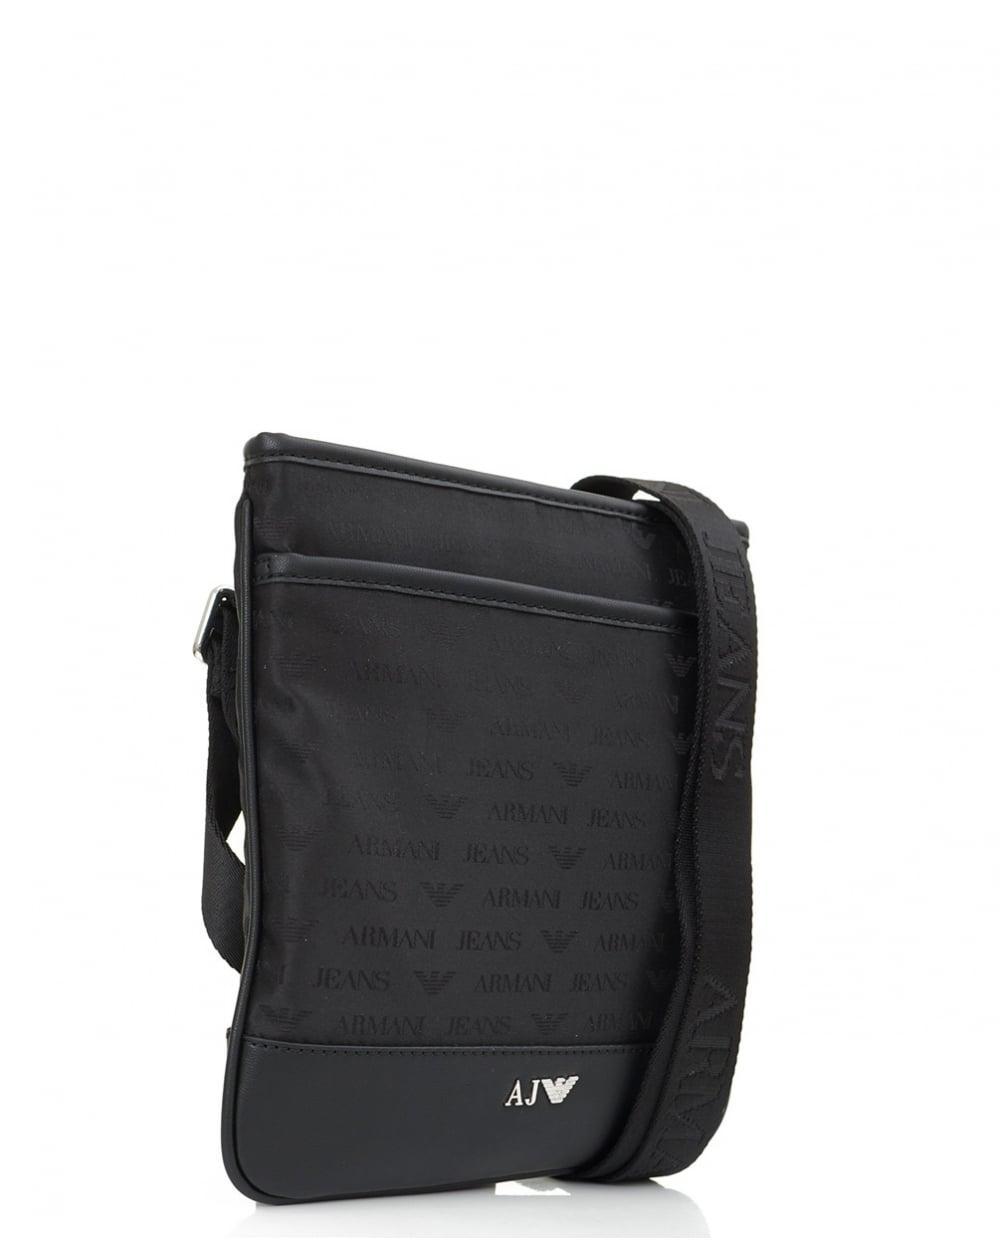 Lyst - Armani Jeans Small Embossed Nylon Logo Stash Bag in Black for Men 1d88155199a